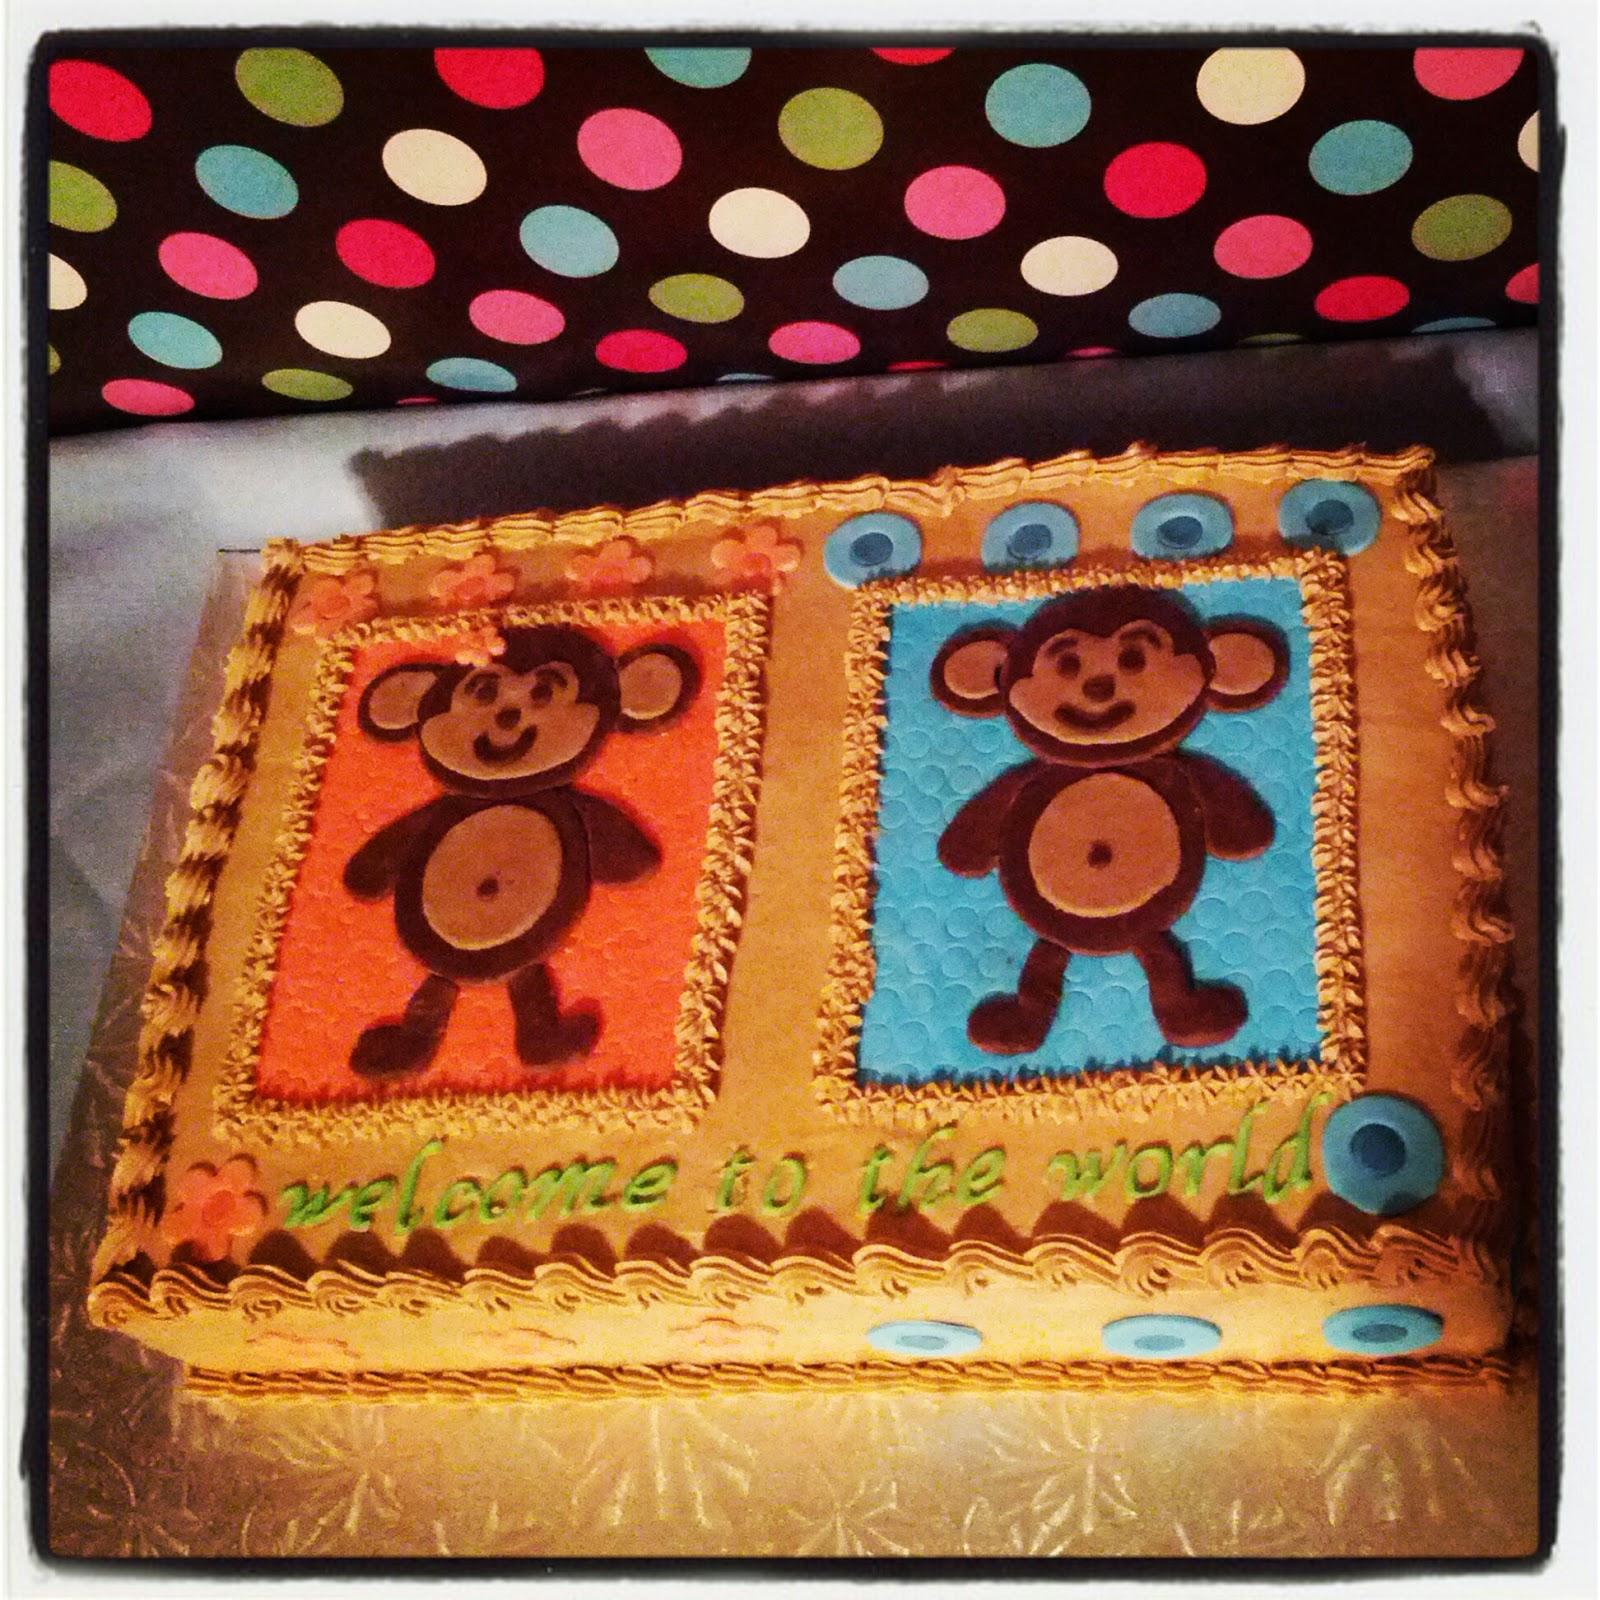 Second generation cake design boy girl monkey baby shower cake - Monkey baby shower cakes for boys ...